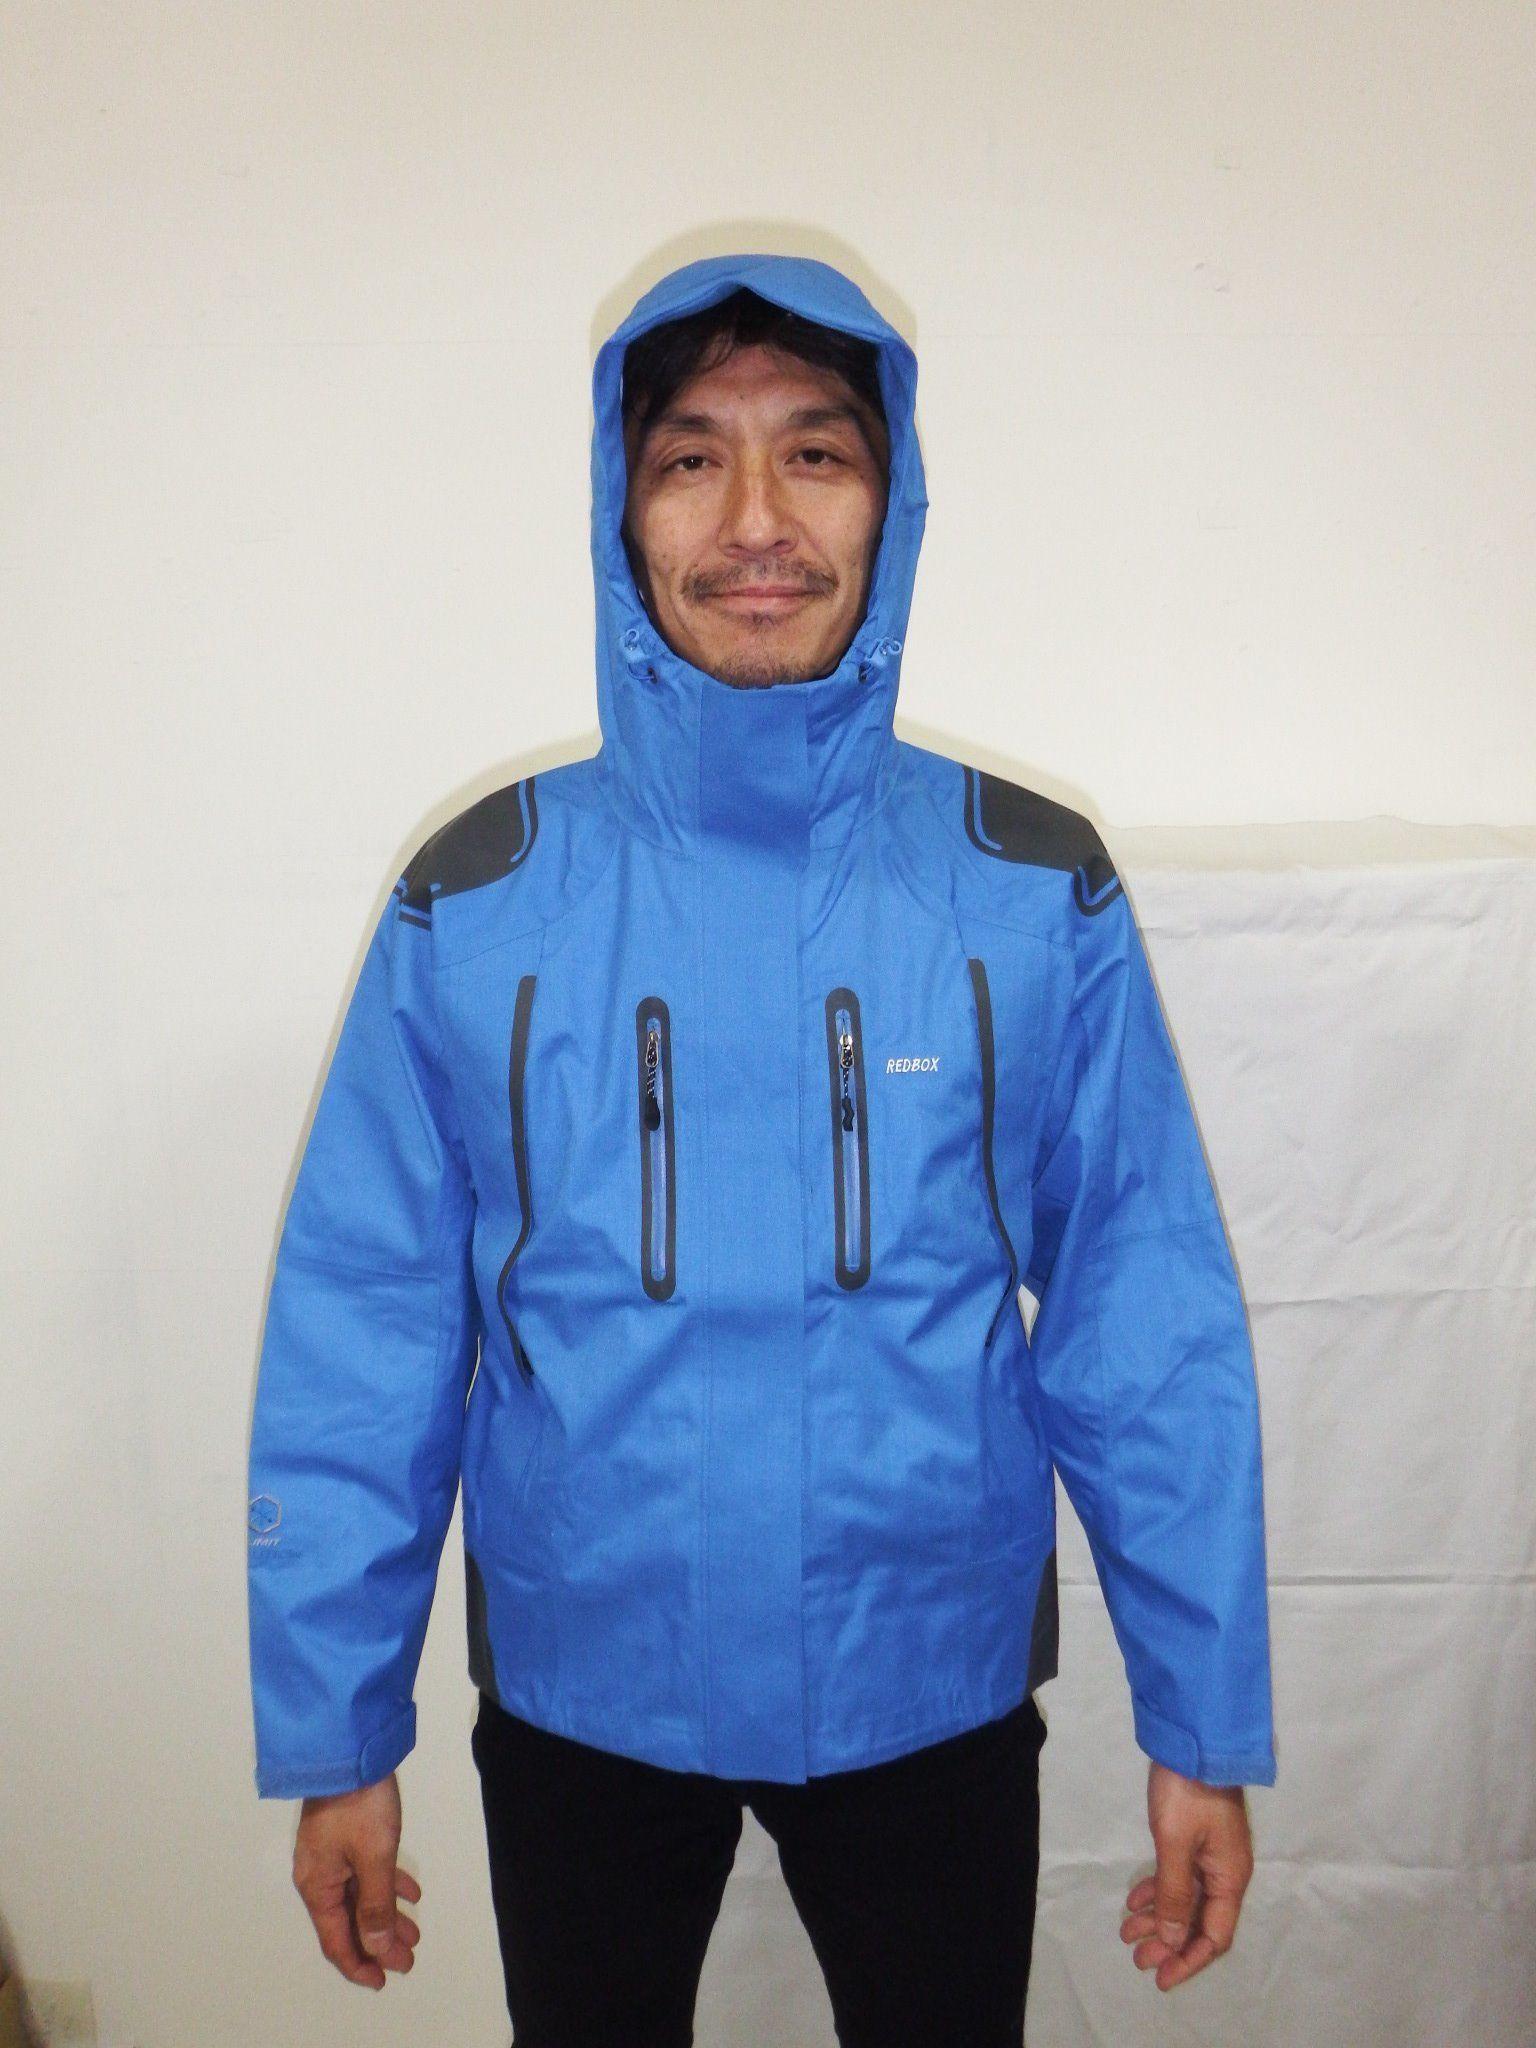 19 USREDBOXマウンテンジャケット2.5L ゴアテックス同素材青M